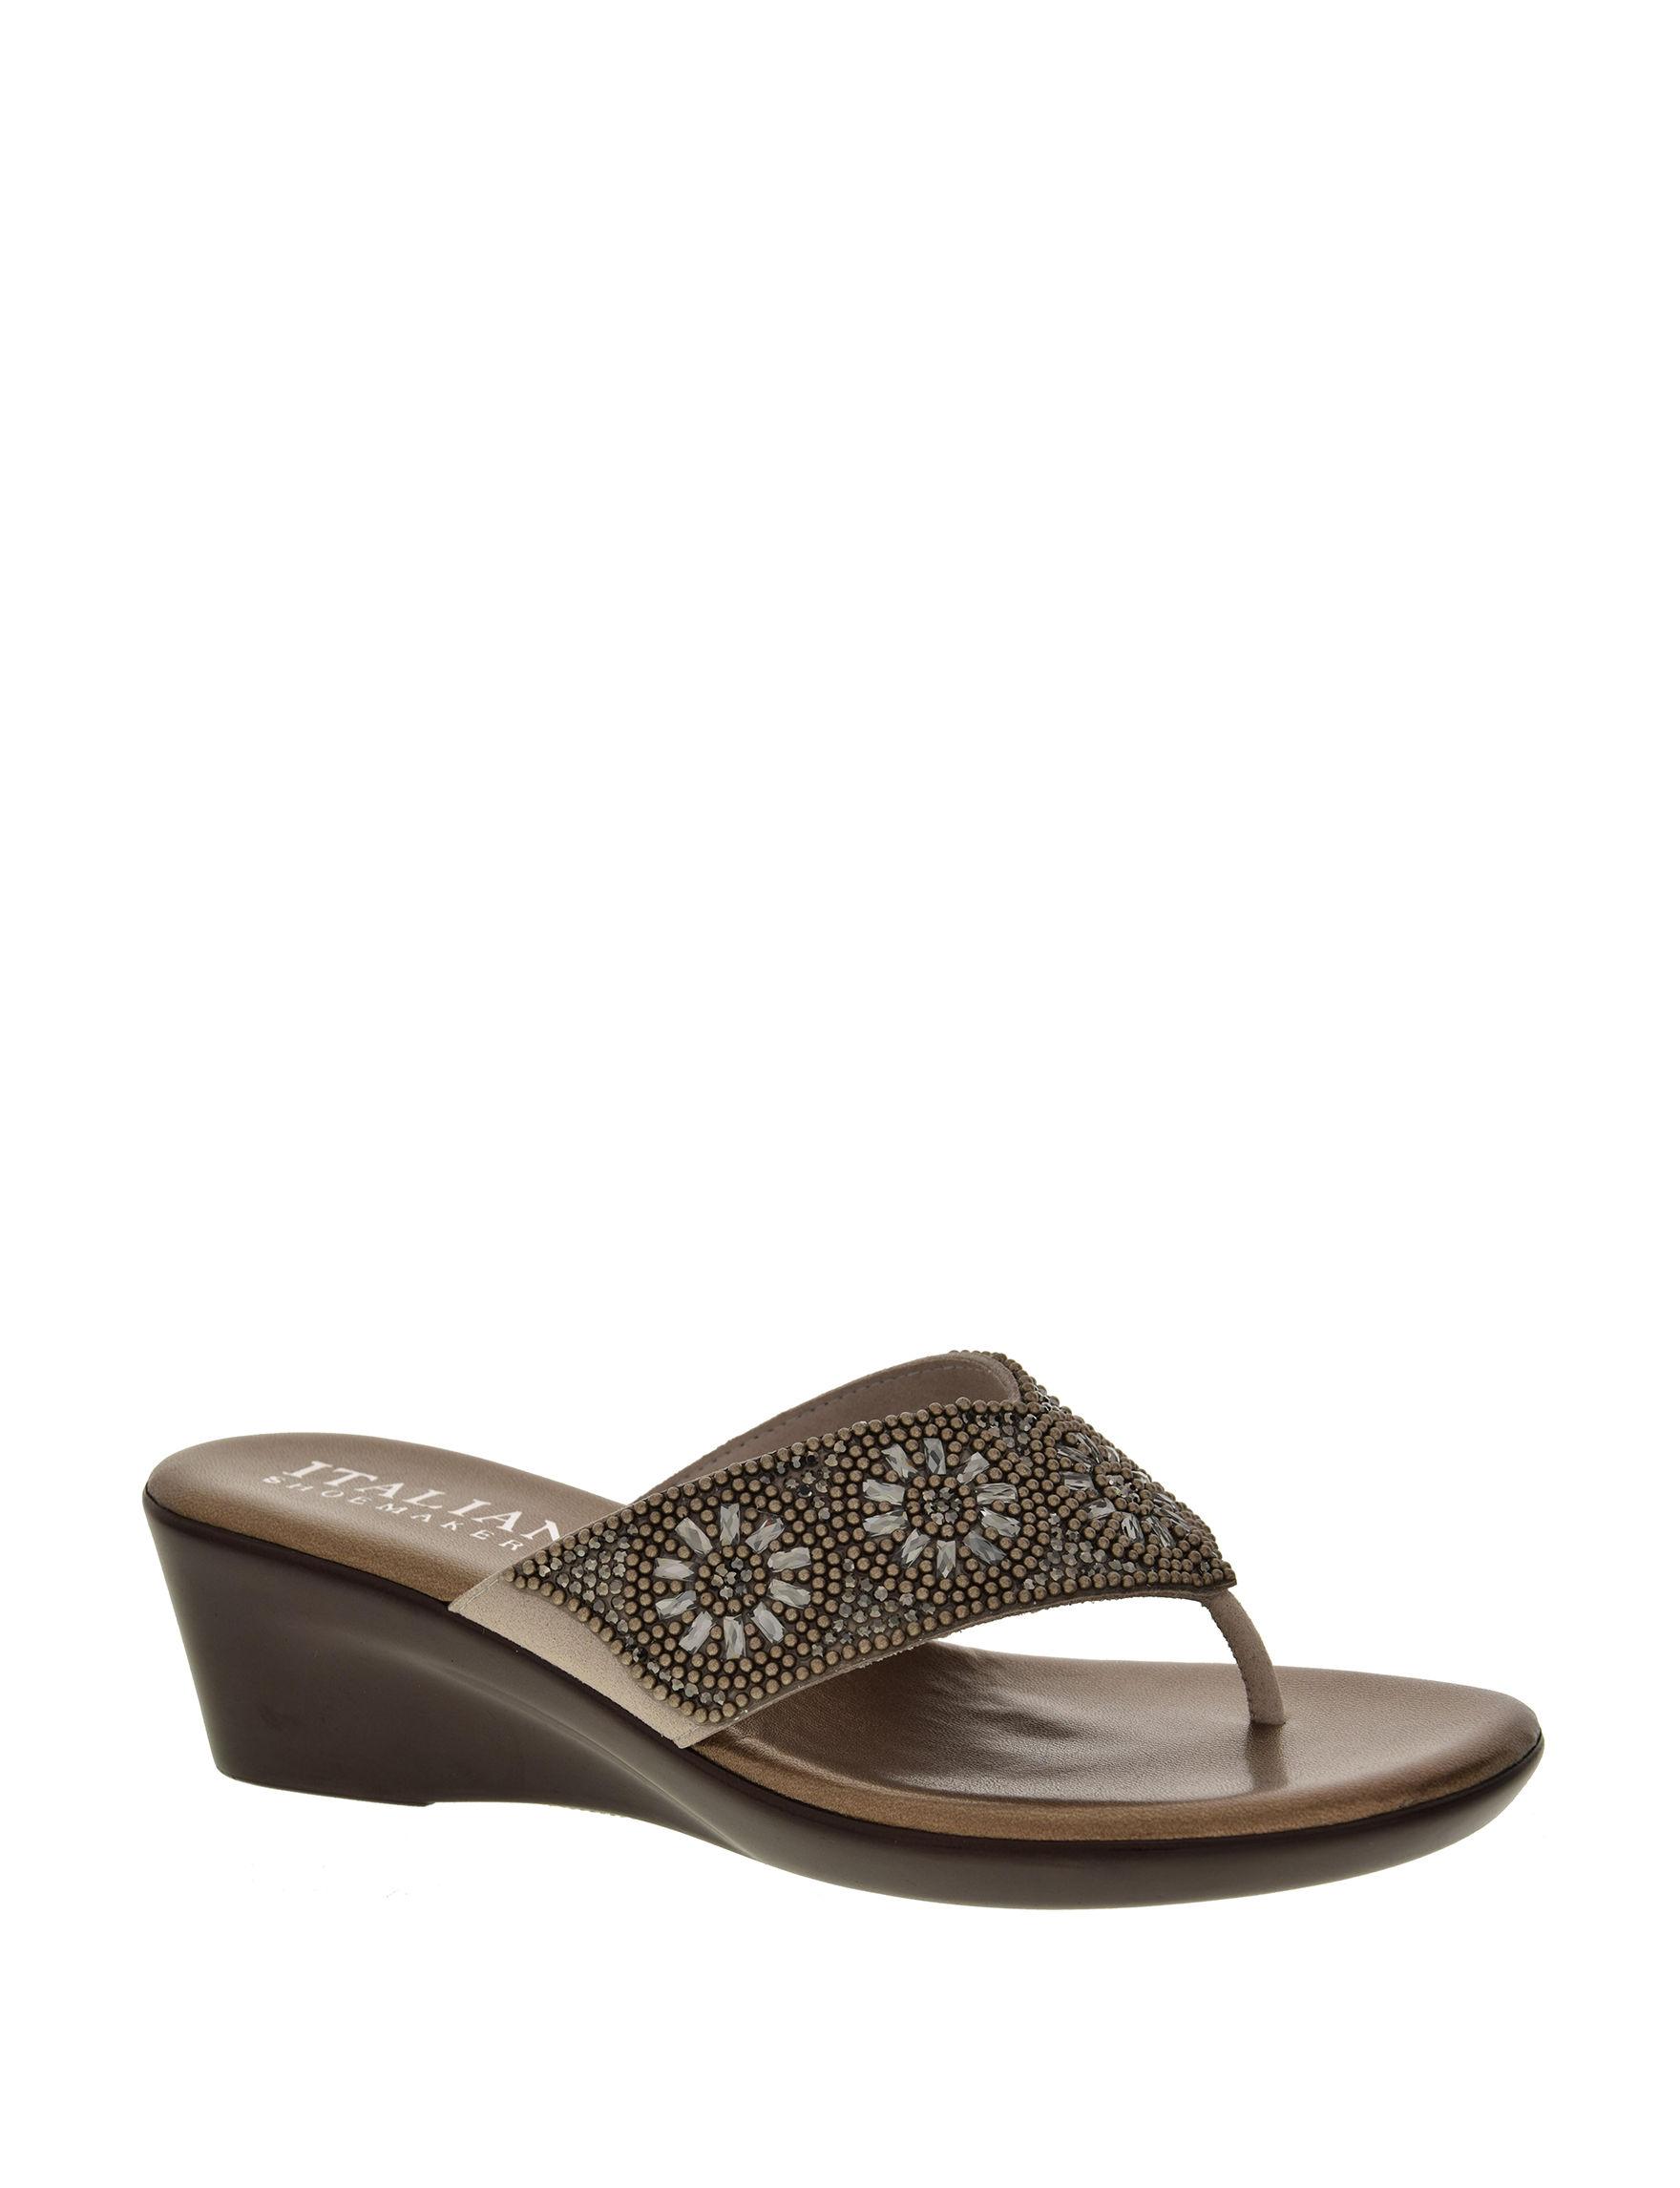 full notrl image to s voyage fingerhut sandals over sandal uts click zoom for comfort scl fergalicious va women wedge product comforter hover